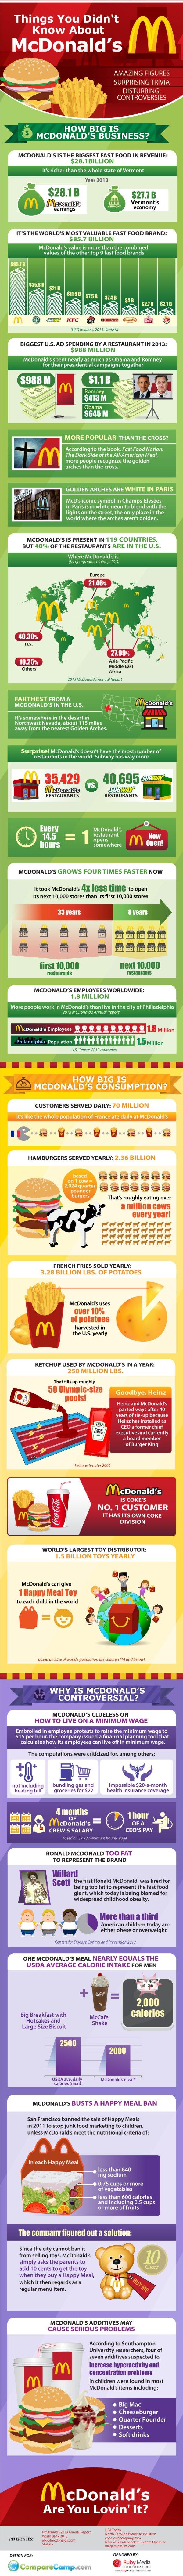 facts about mcdonalds